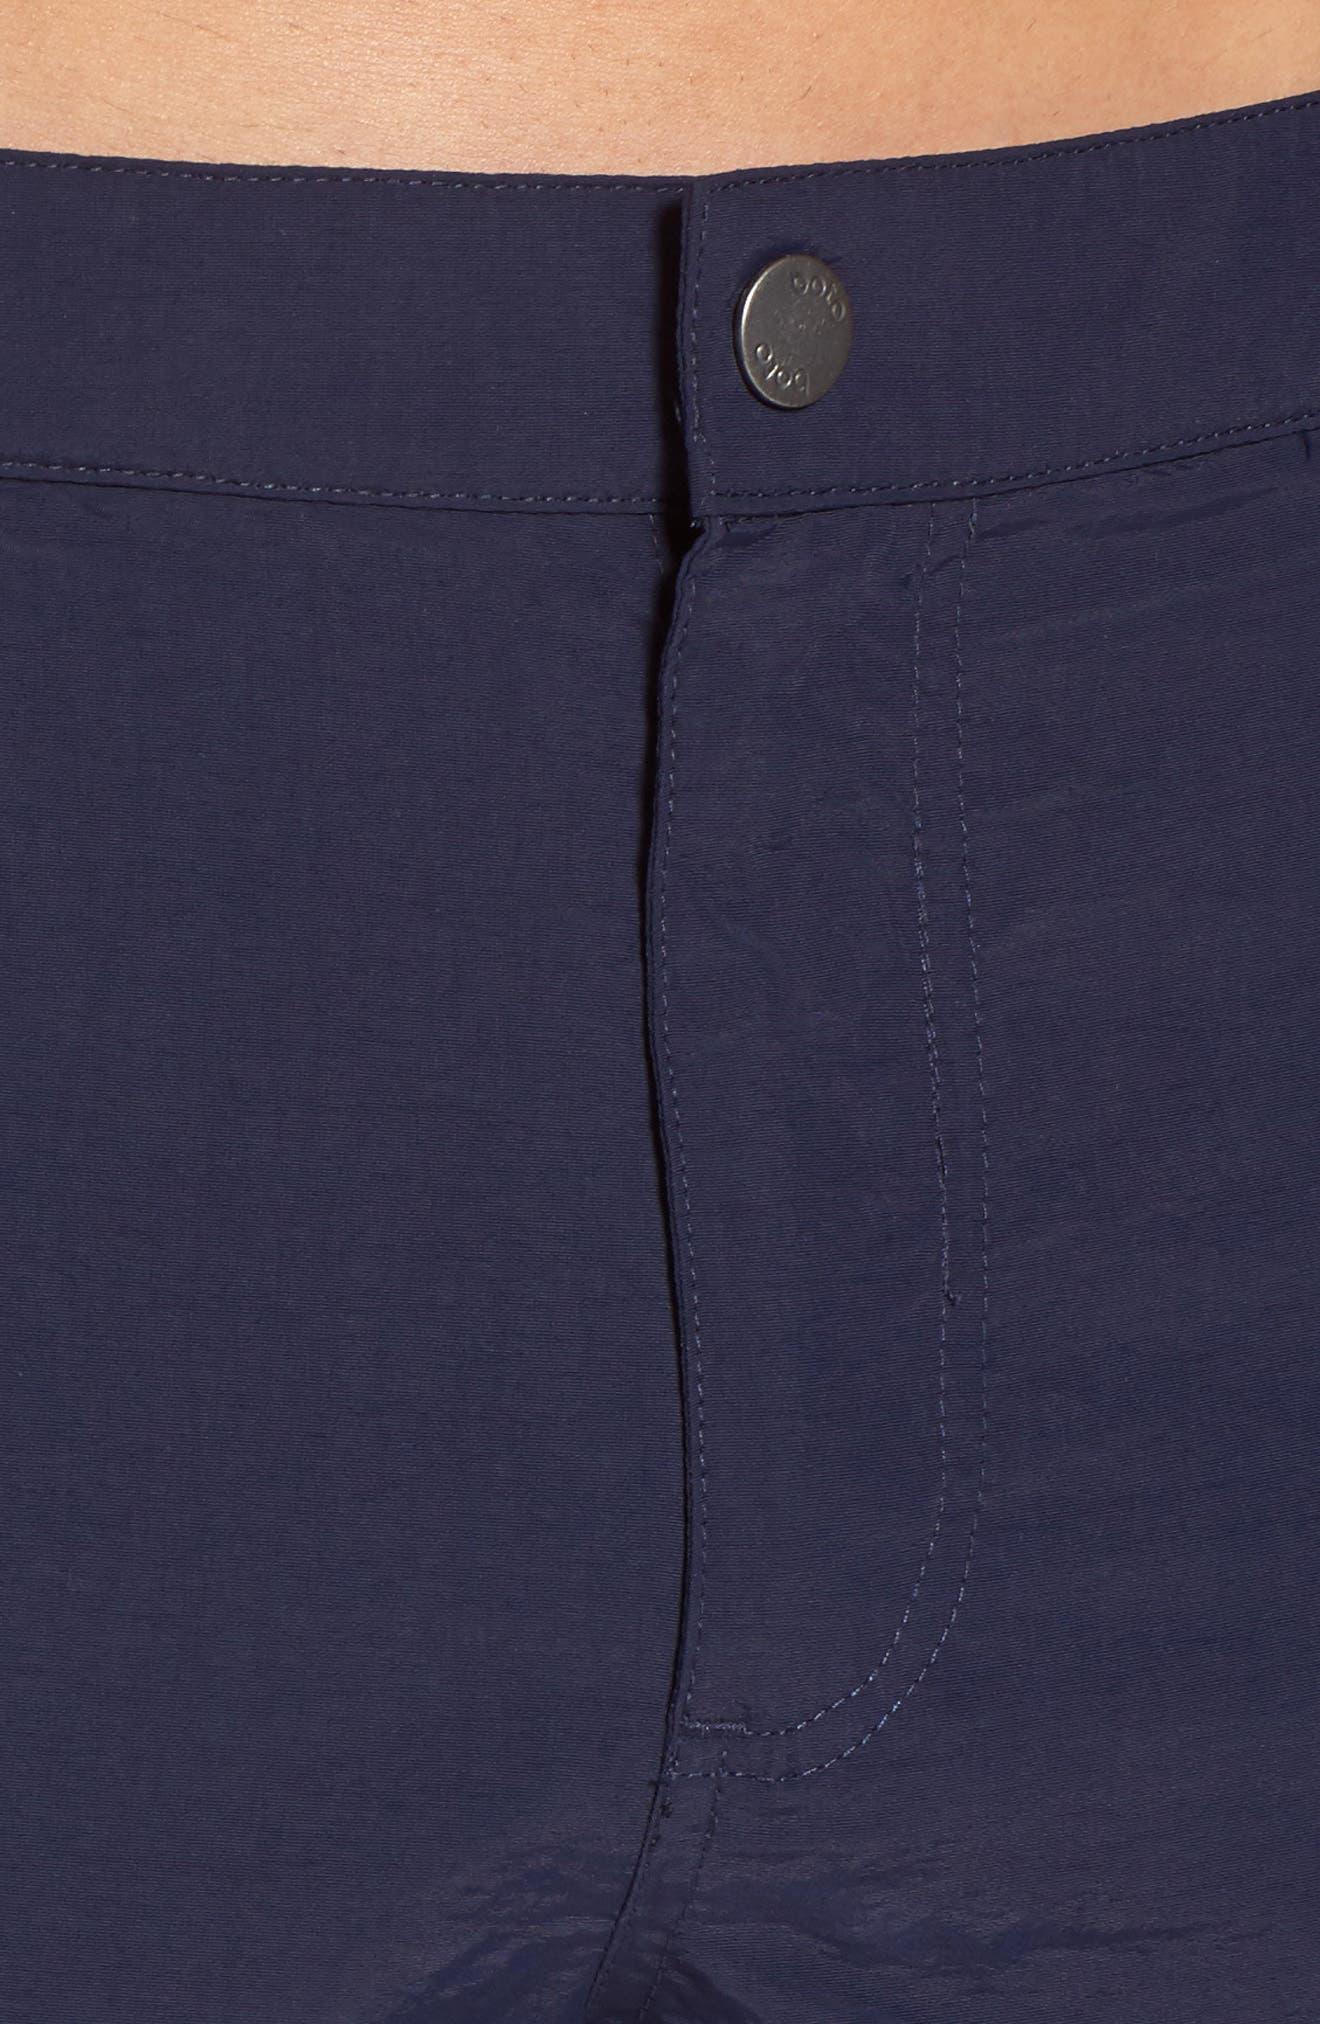 Aruba Tailored Fit French Stripe Swim Trunks,                             Alternate thumbnail 8, color,